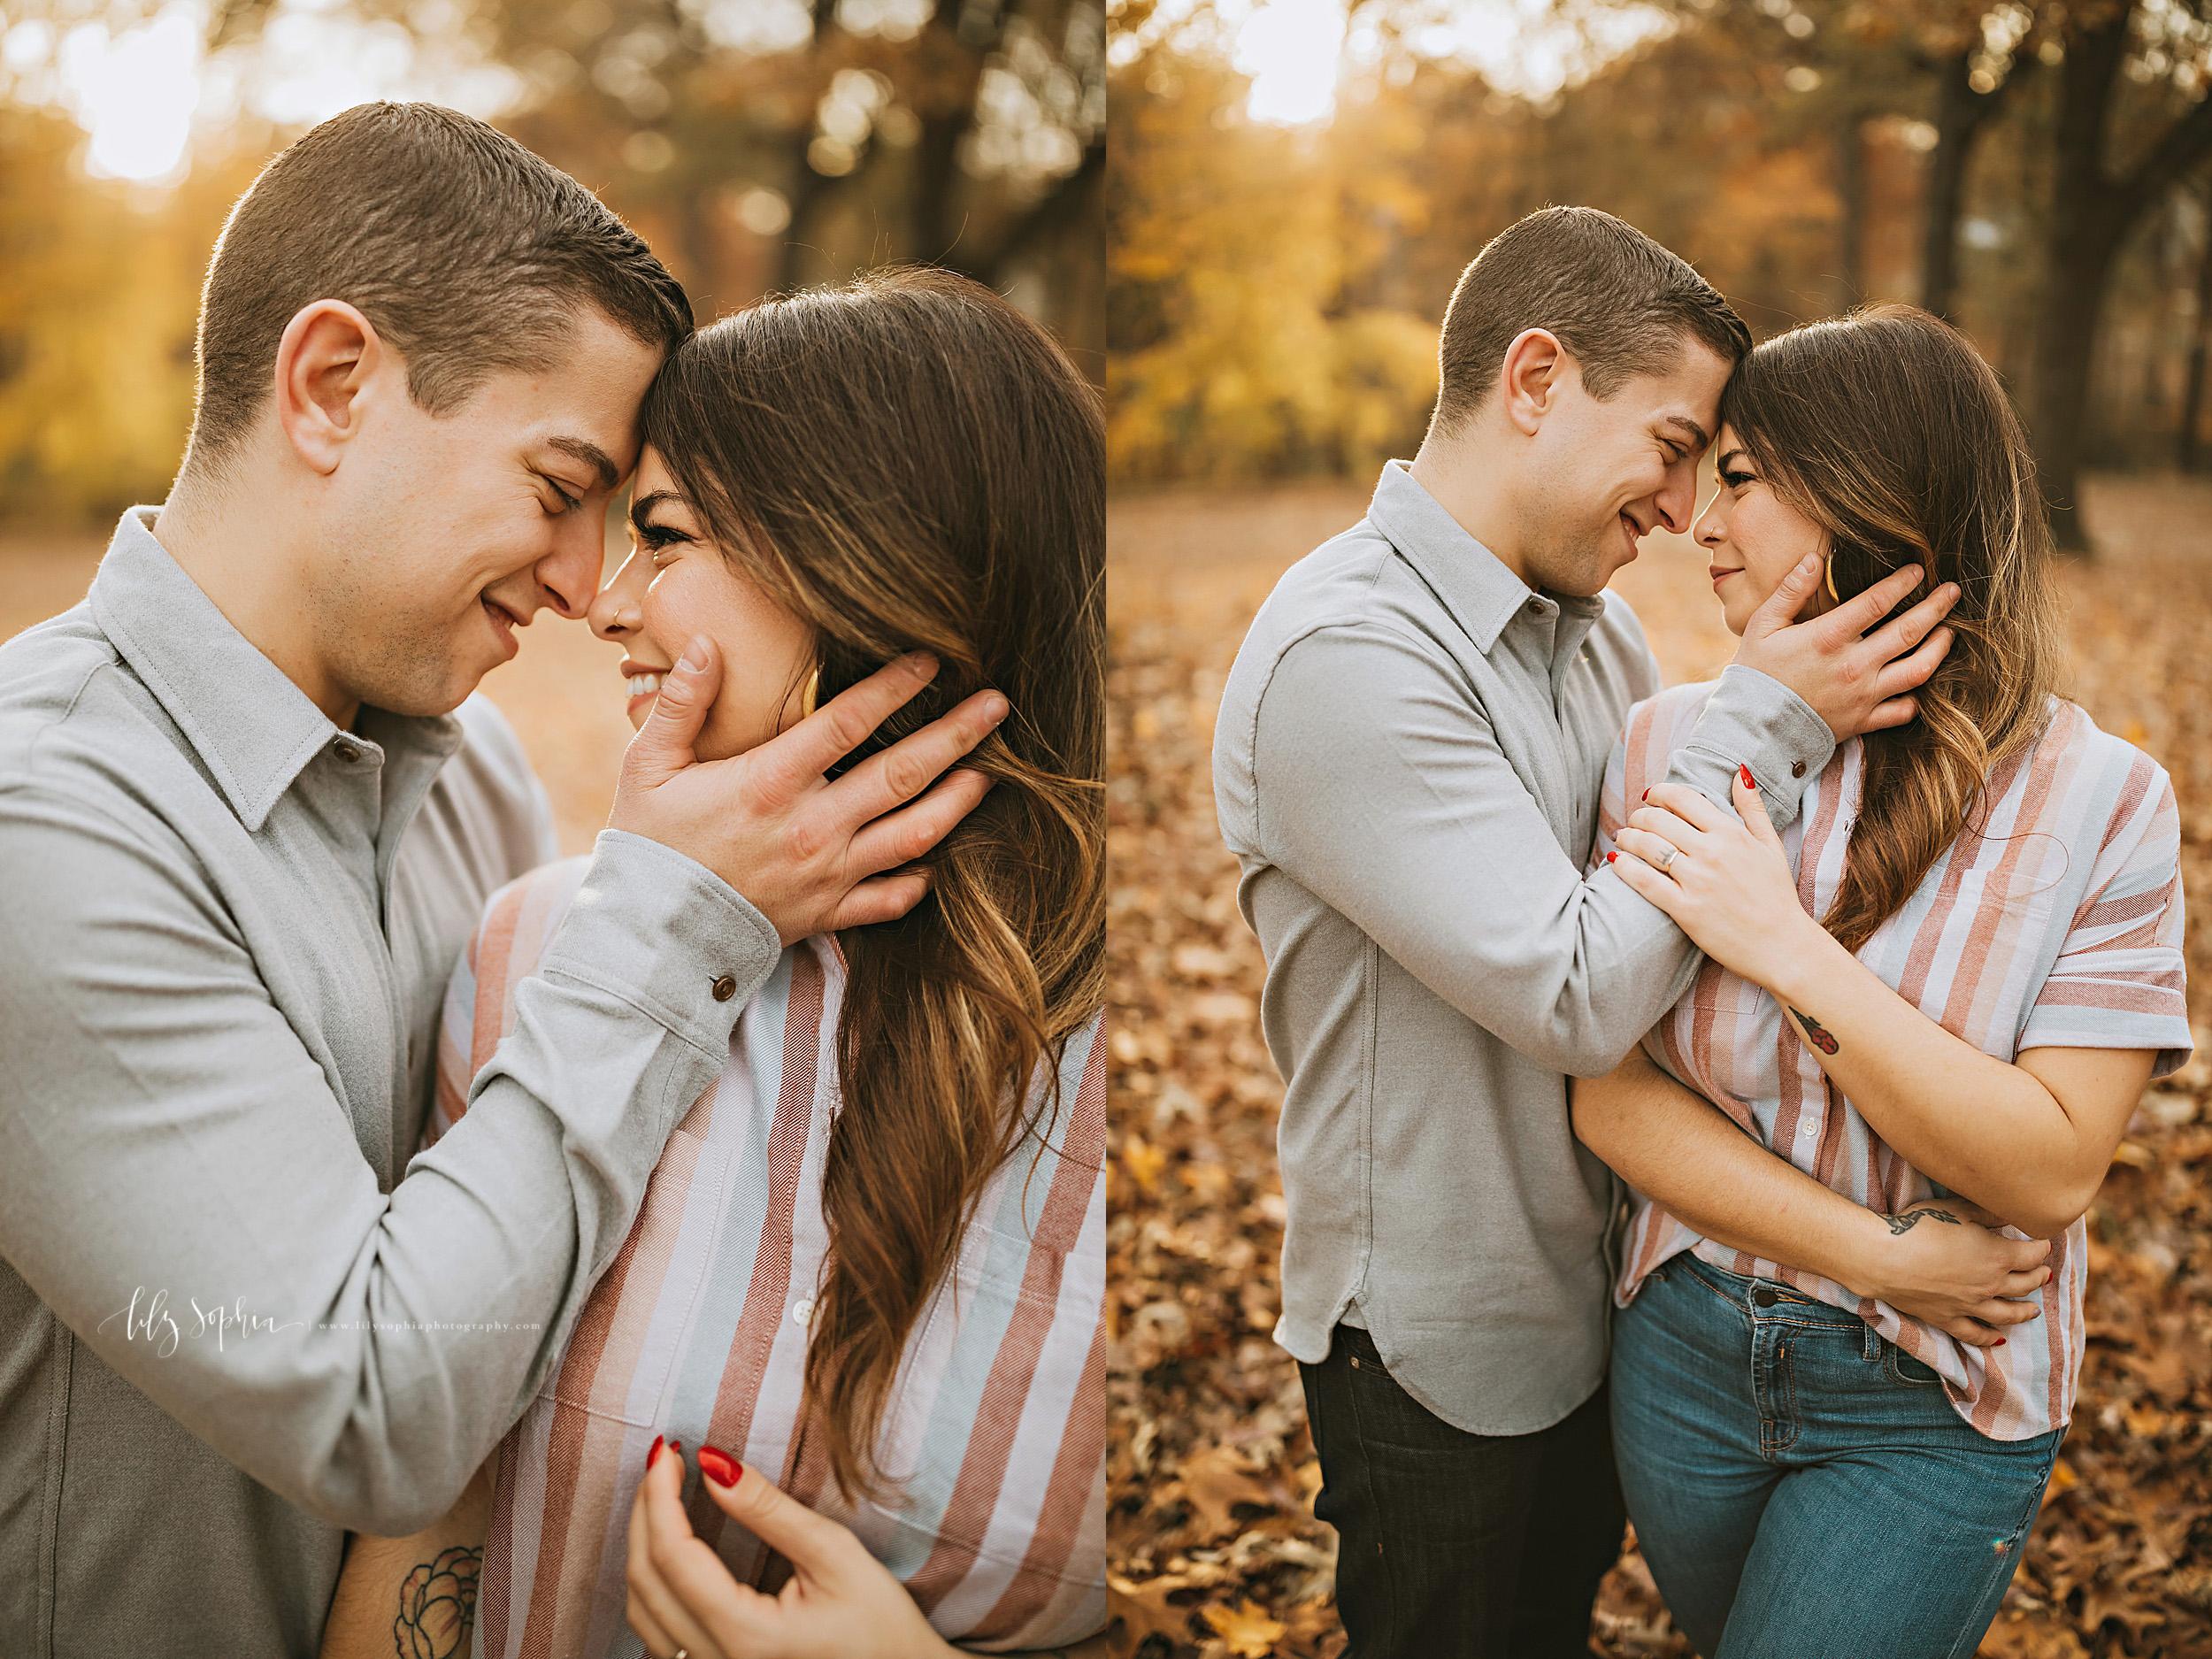 atlanta-reynoldstown-peoplestown-decatur-sandy-springs-buckhead-virginia-highlands-west-end-decatur-lily-sophia-photography-outdoor-fall-couples-photos_1480.jpg